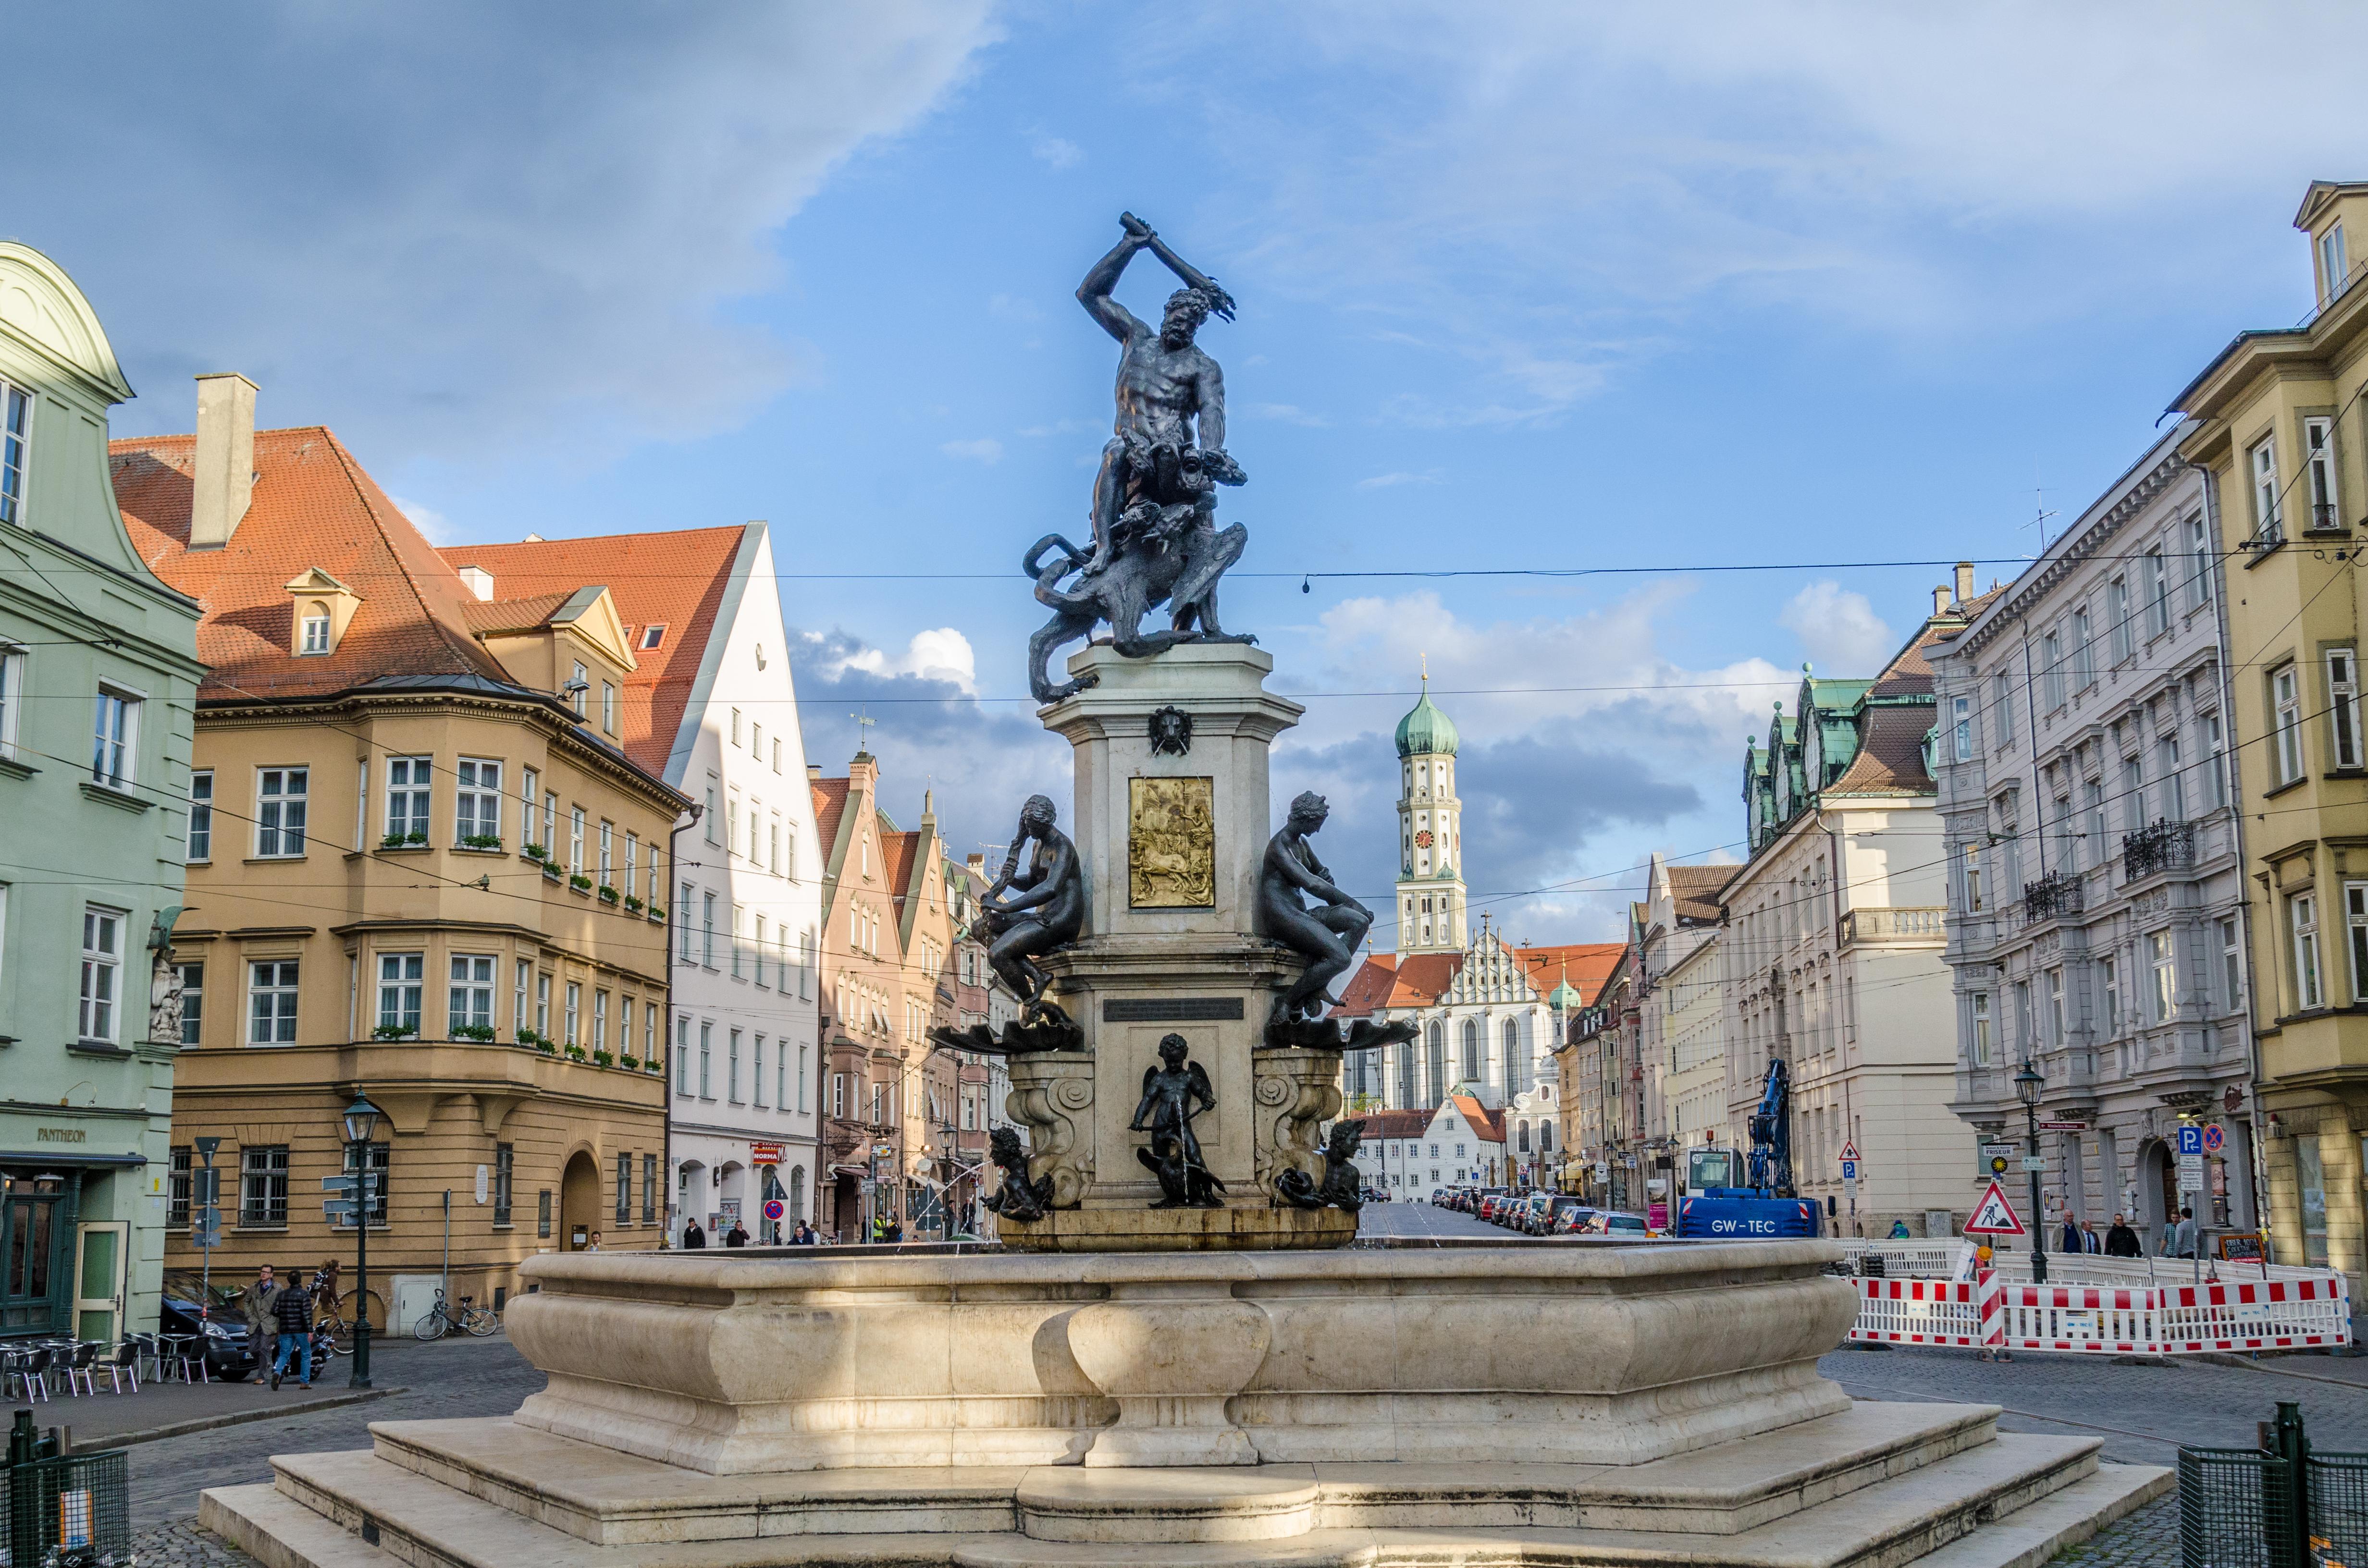 https://upload.wikimedia.org/wikipedia/commons/7/73/Augsburg,_Maximilanstra%C3%9Fe,_Herkulesbrunnen,_001.jpg